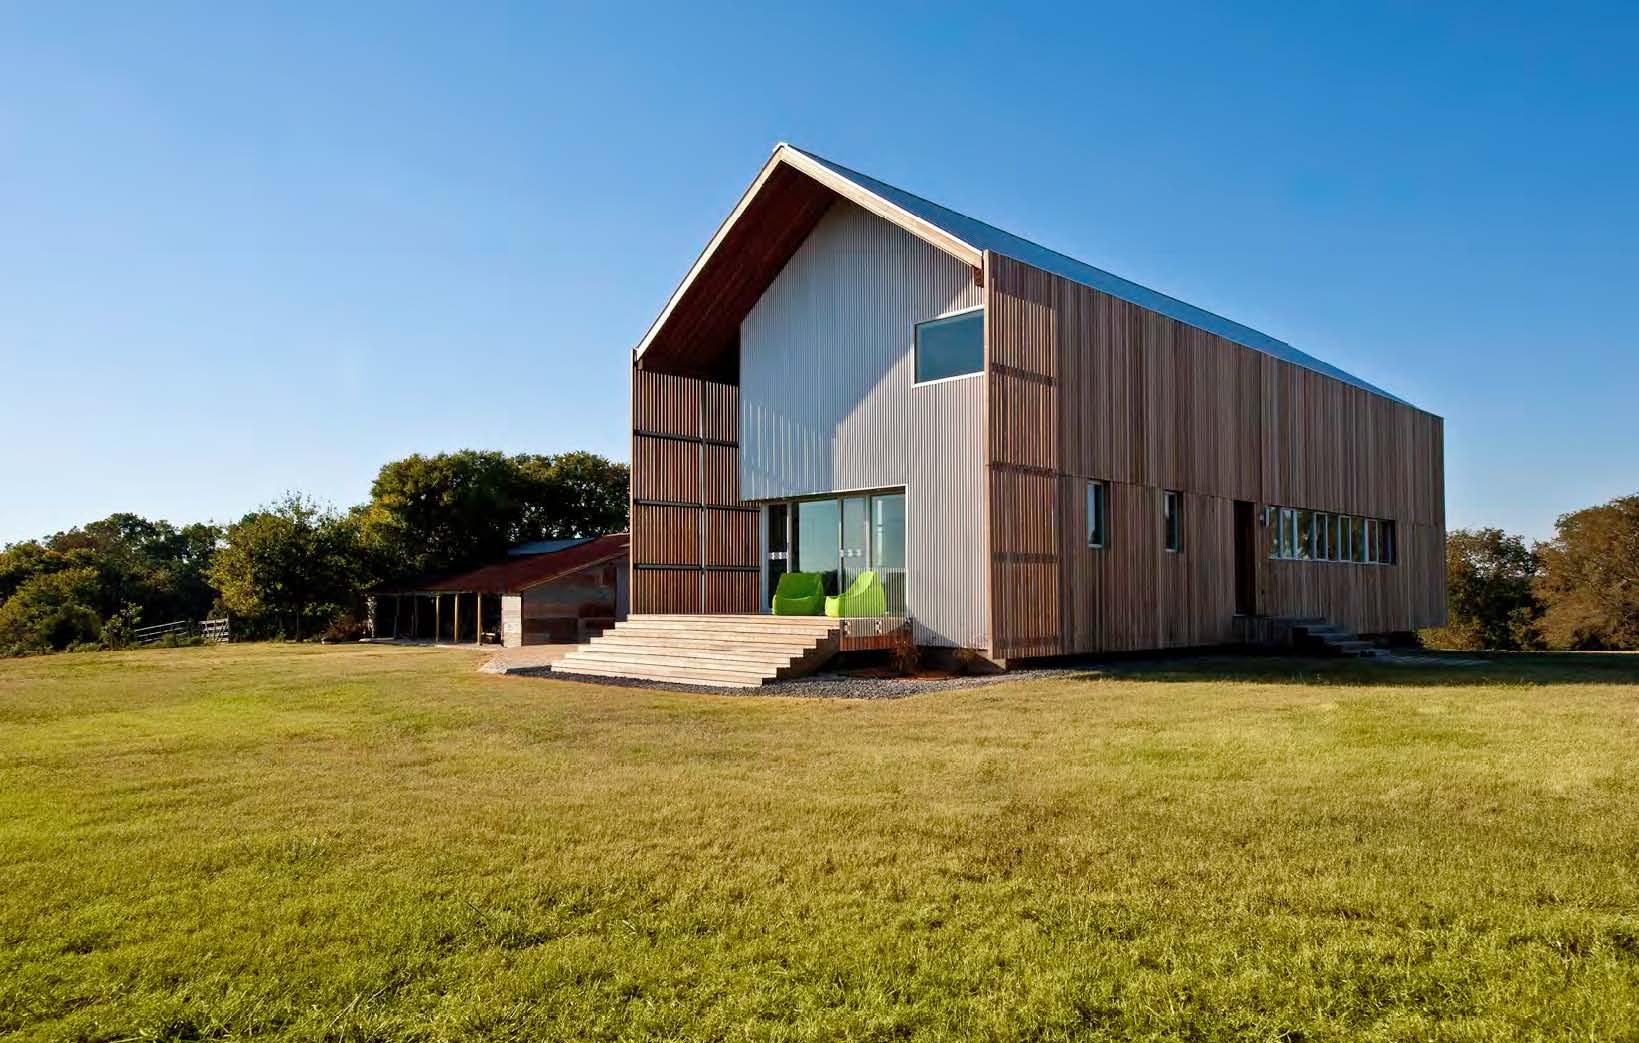 Brenham (TX) United States  city pictures gallery : | Logan / Johnson Architecture LLC, Brenham, TX, United States ...